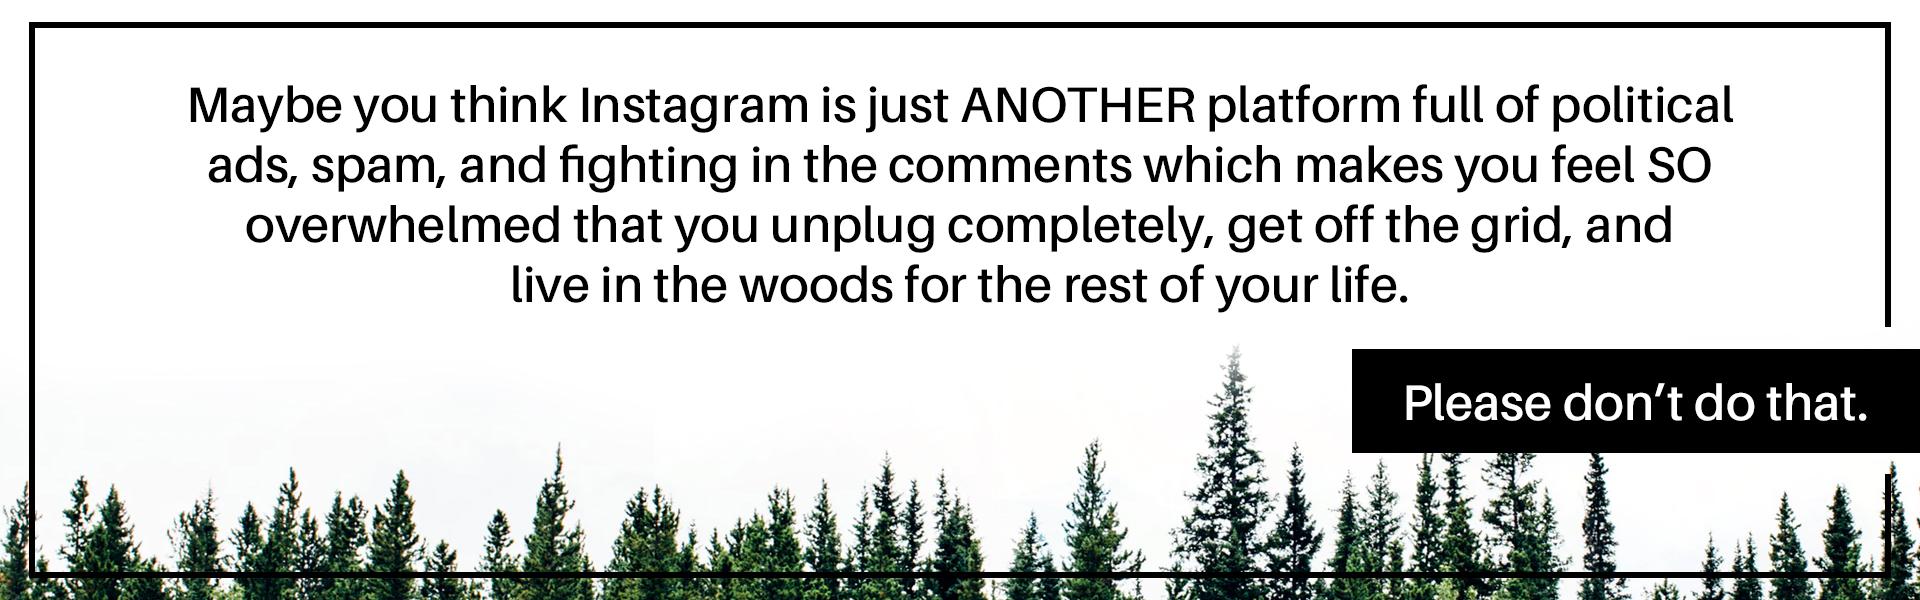 Wood_Slideshow.jpg